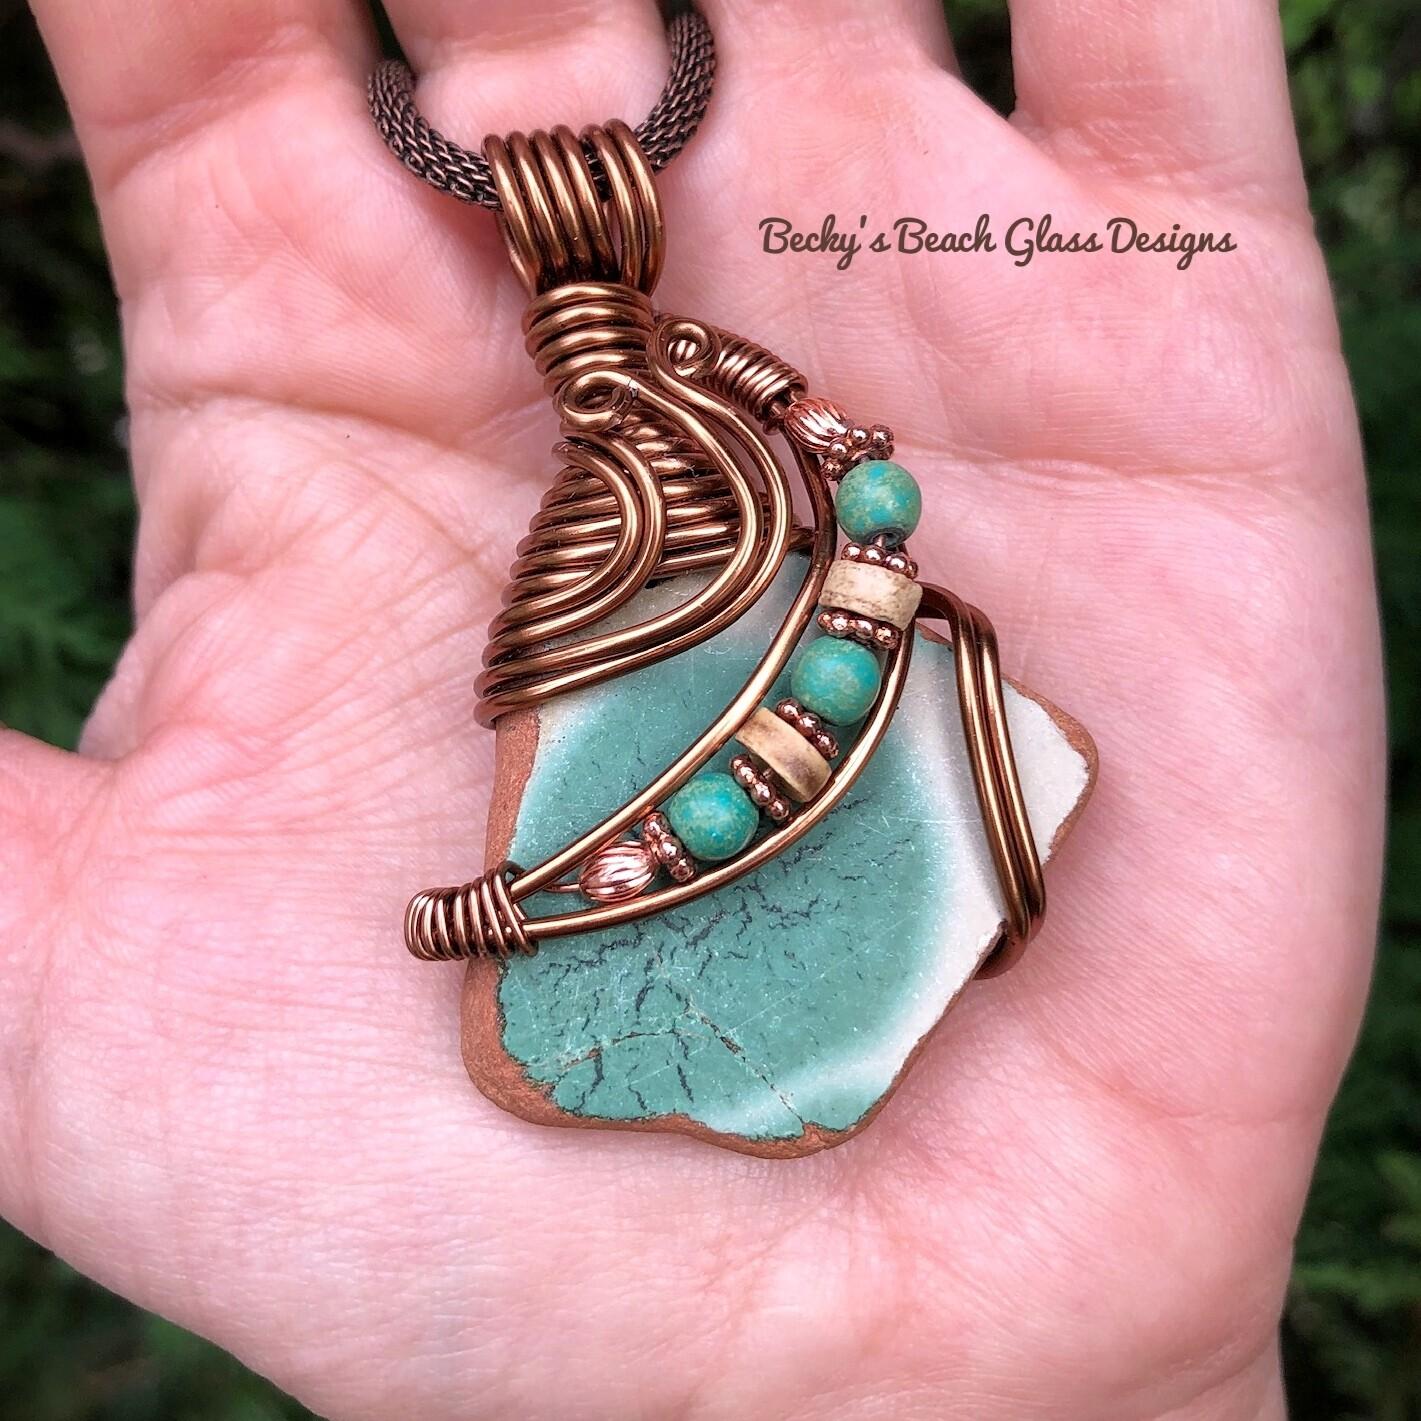 Italian Sea Pottery Terra Cotta Necklace